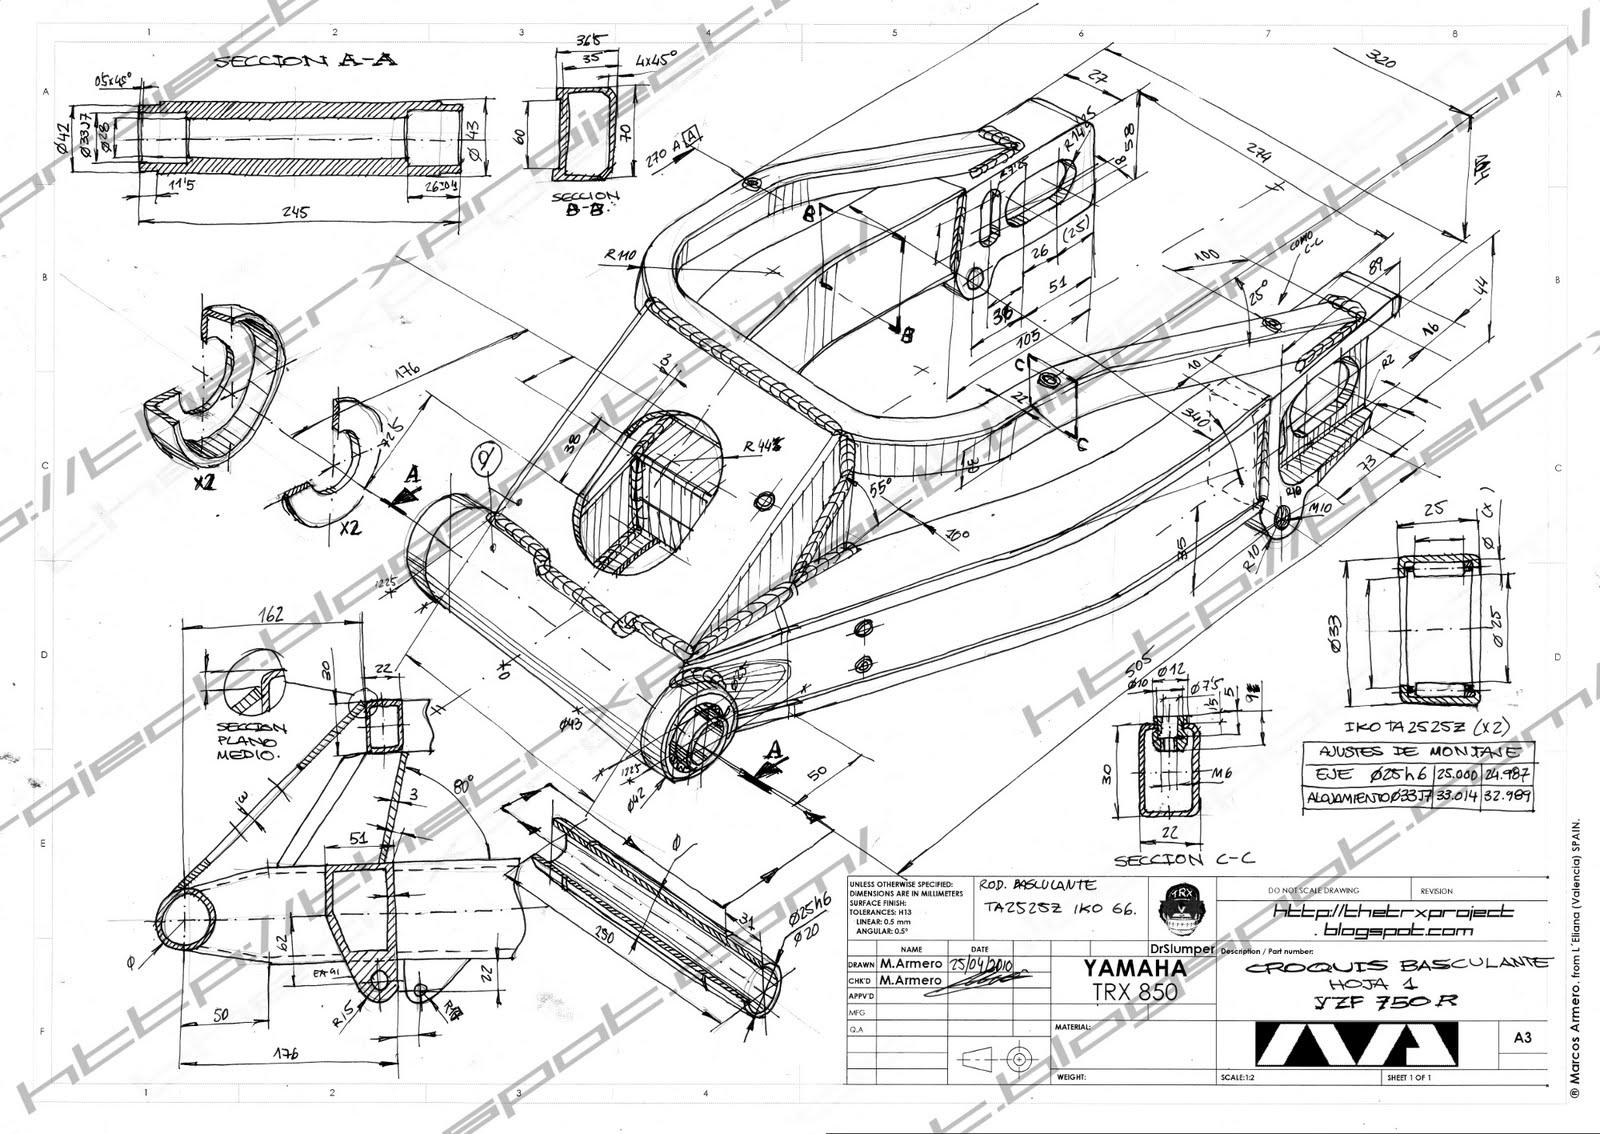 The TRX Project. The Yamaha TRX 850 blog: YZF 750 R Swing